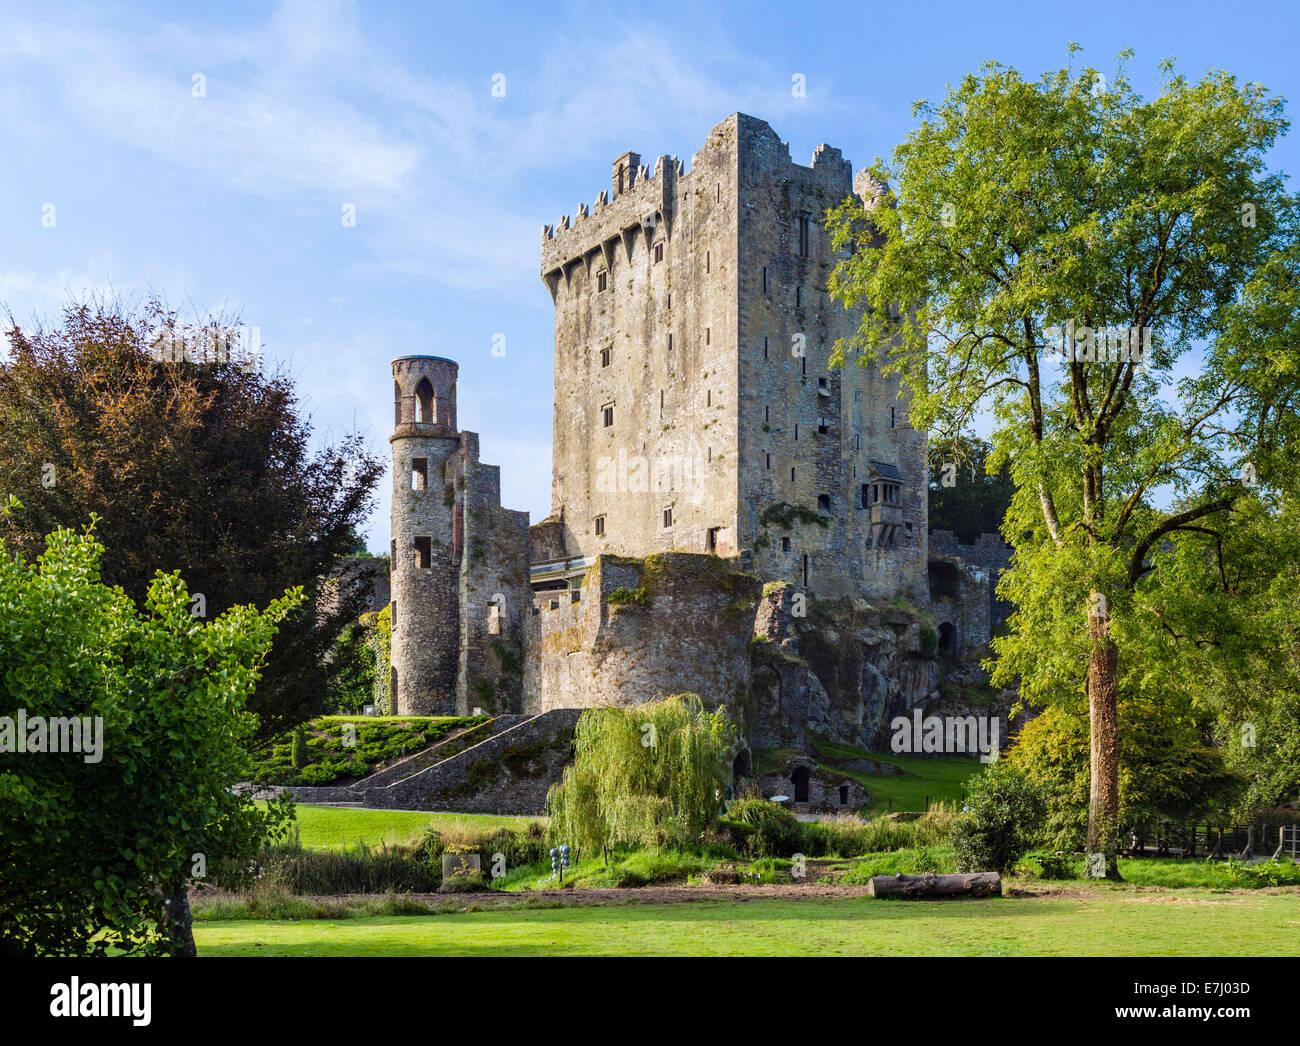 Blarney Castle, site of the Blarney Stone, near Cork, County Cork, Republic of Ireland - Stock Image